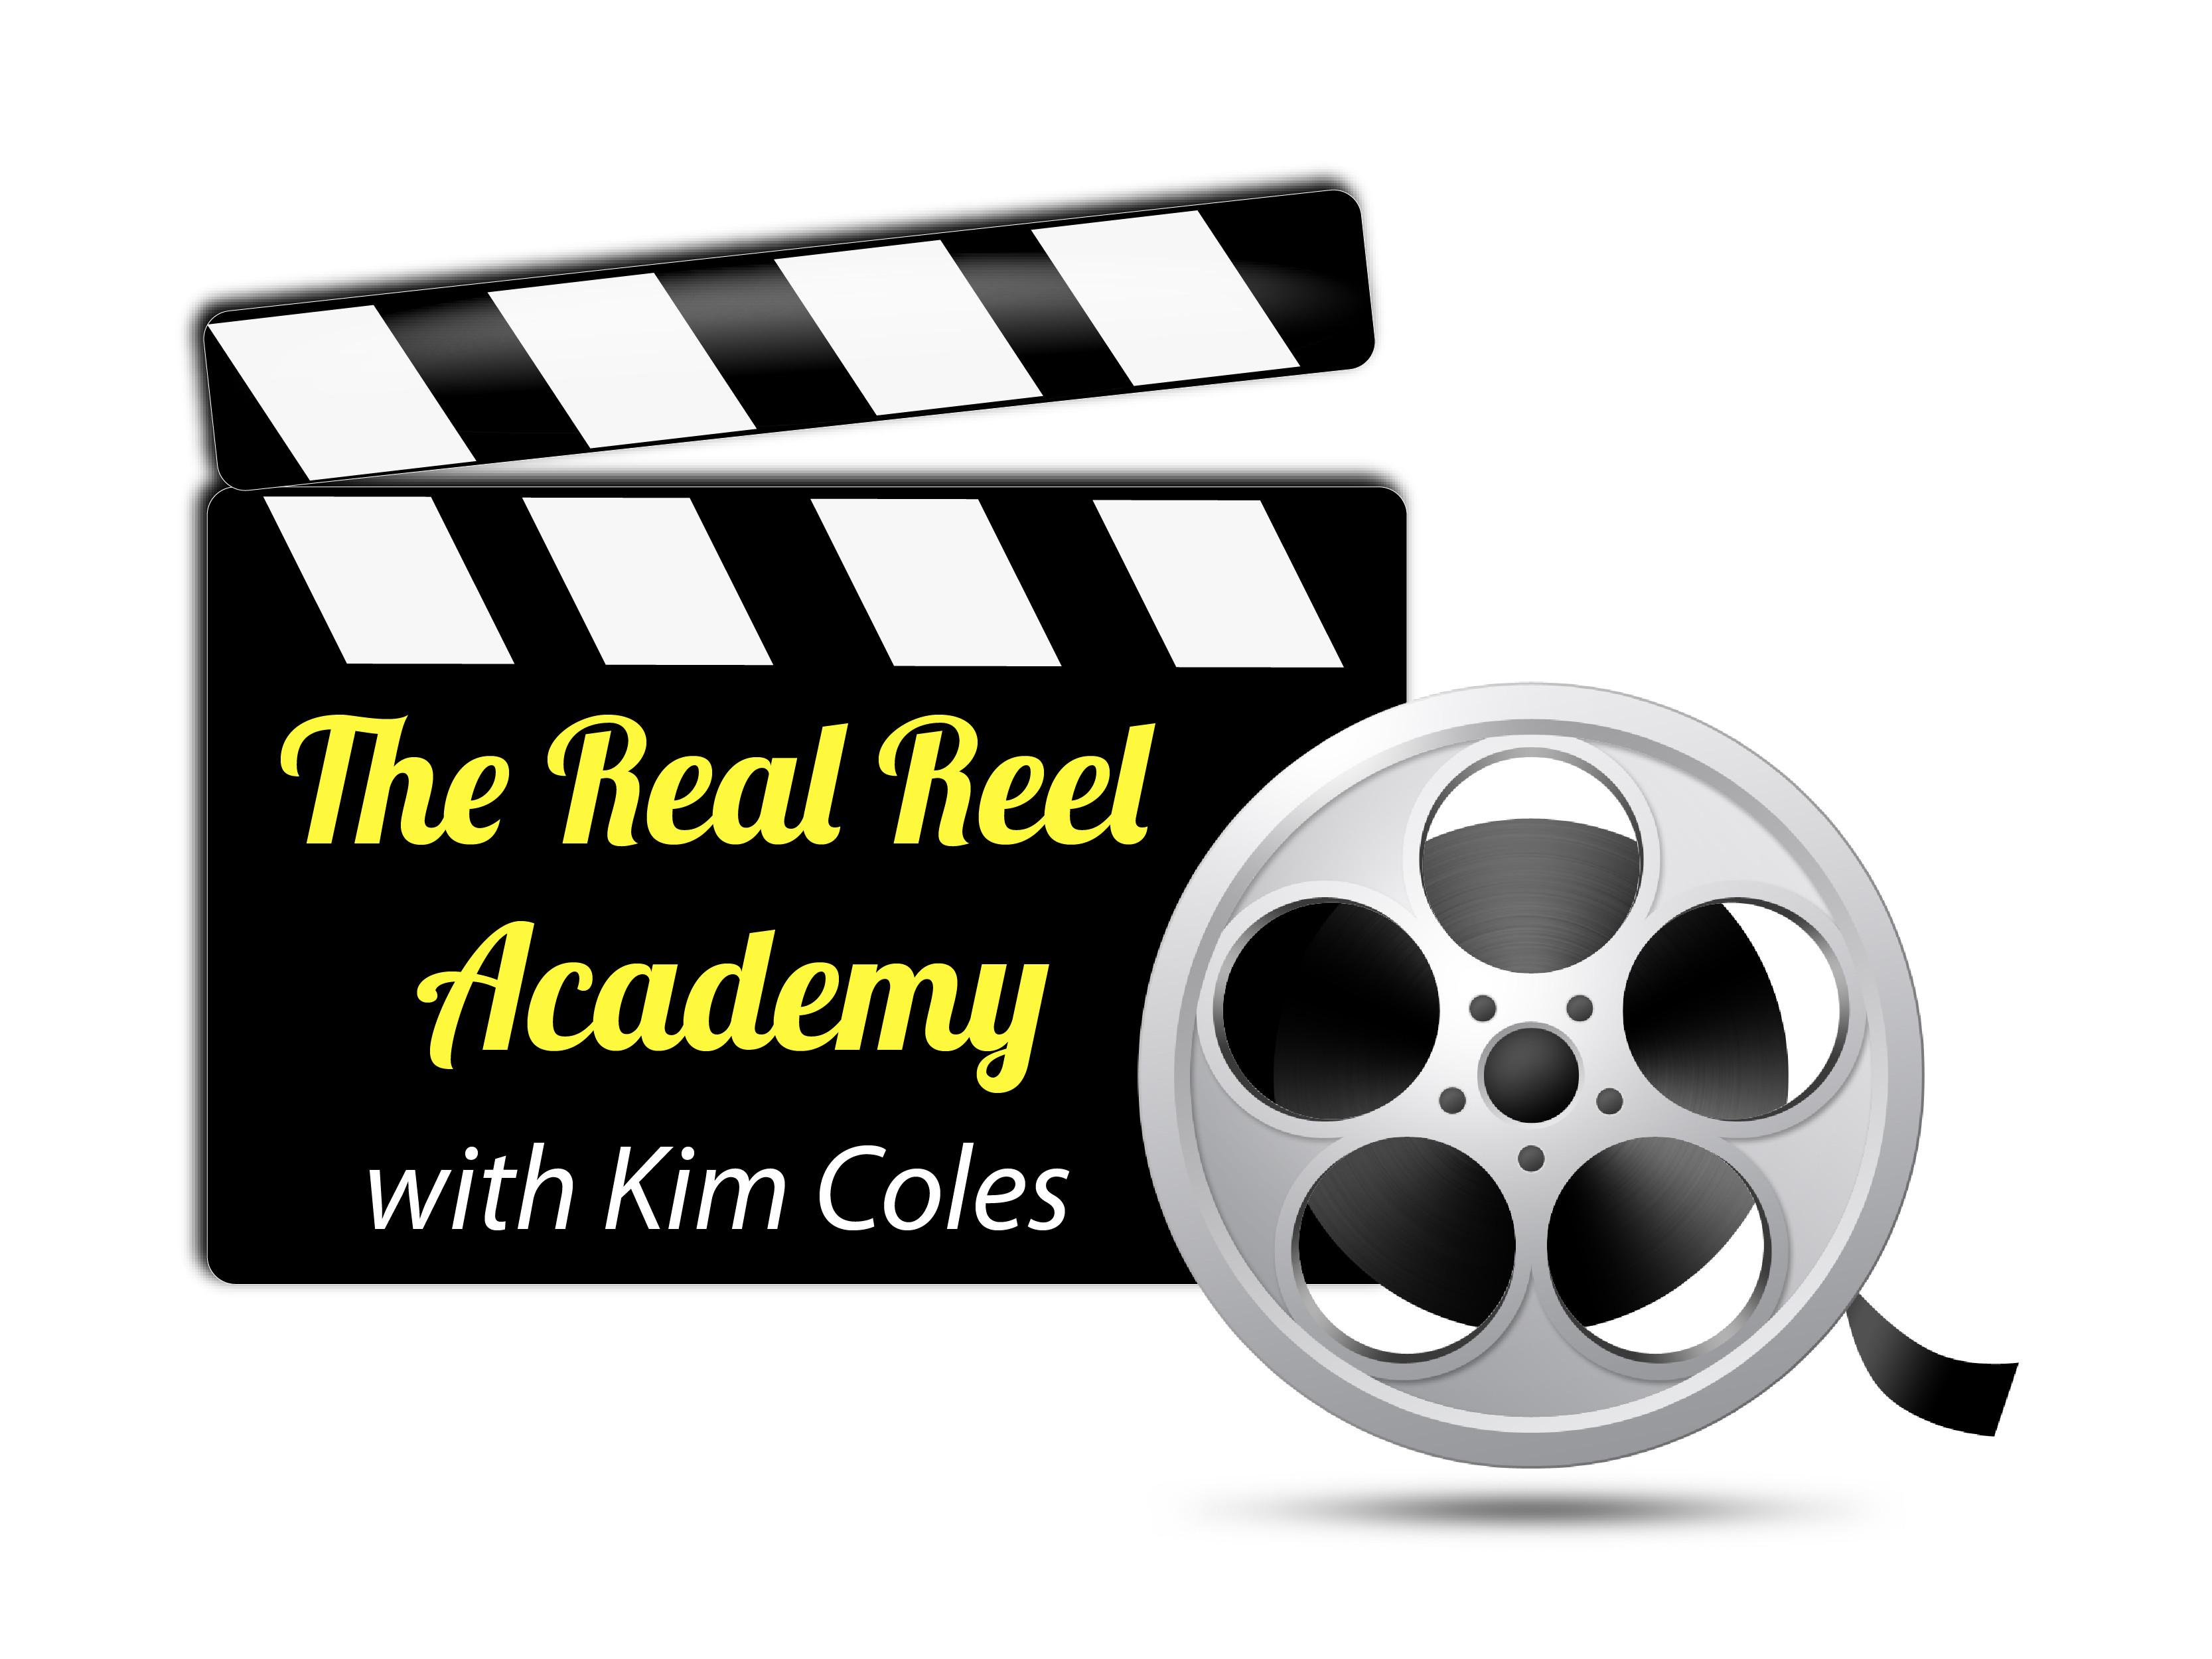 Kim coles celebrity fit club video